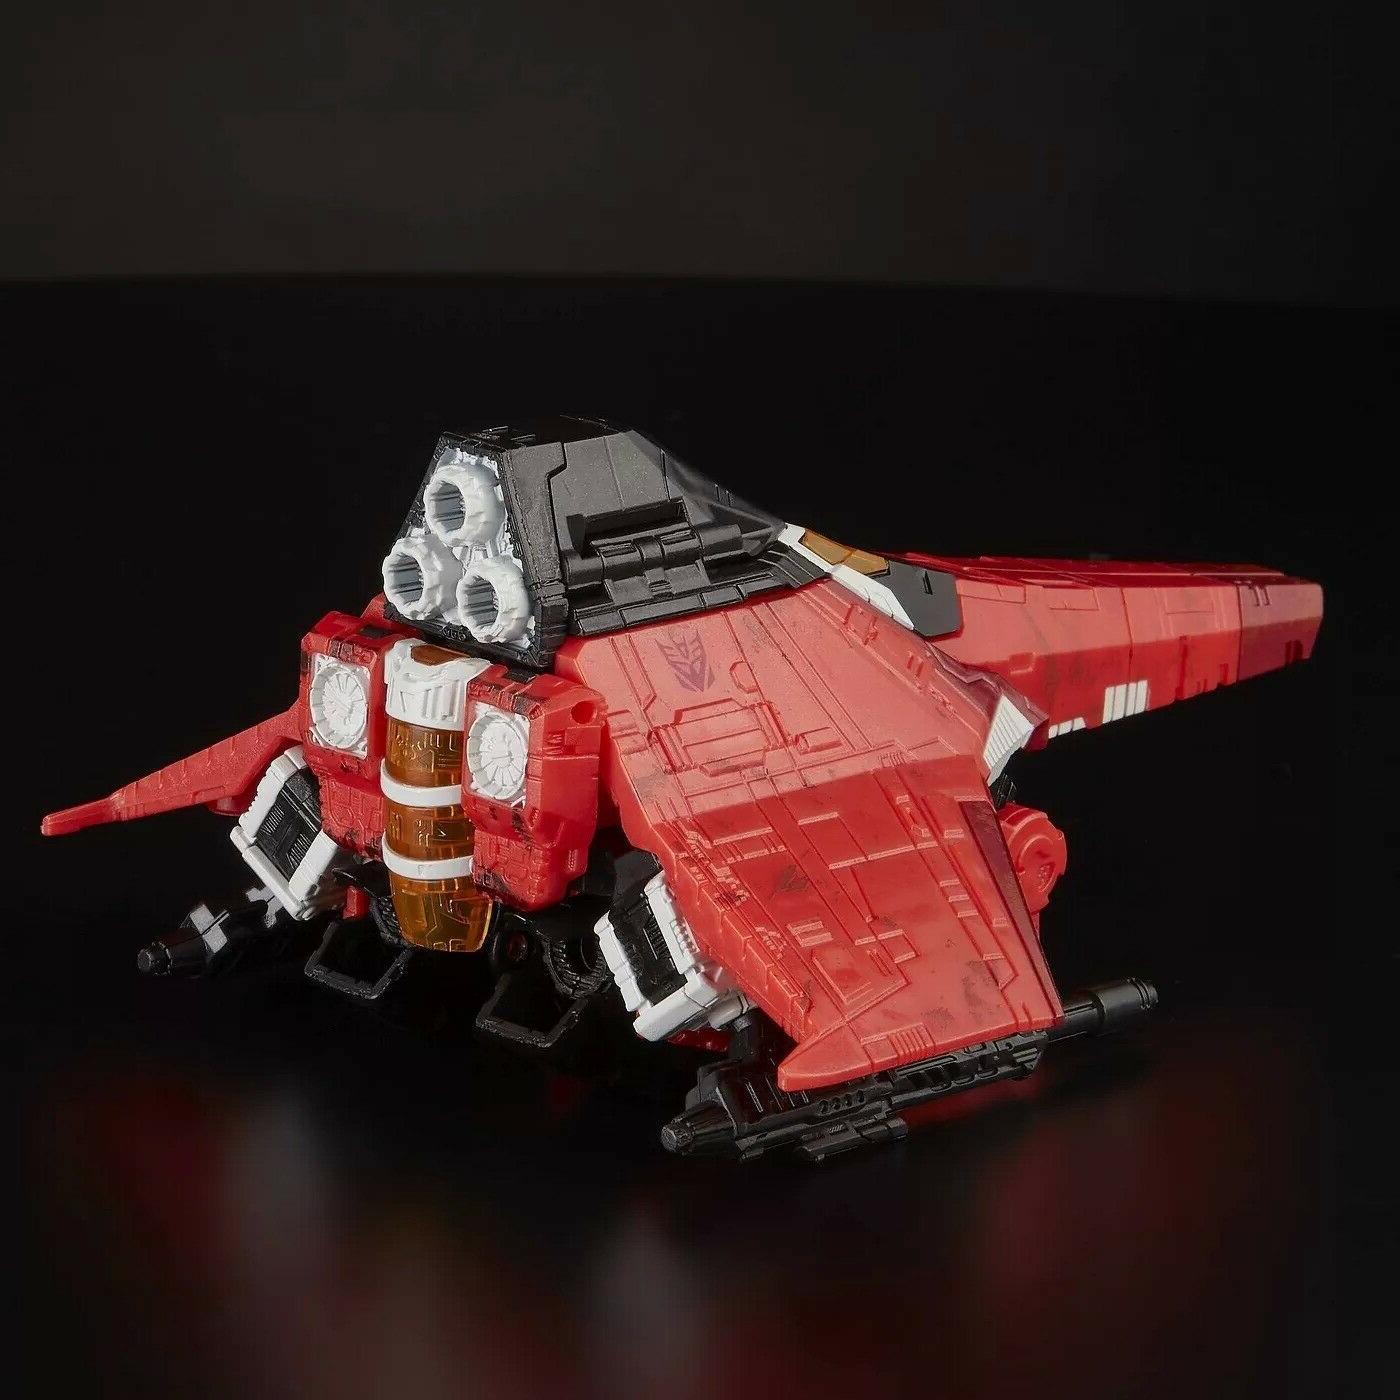 Transformers Red Wing War Siege Voyager Hasbro